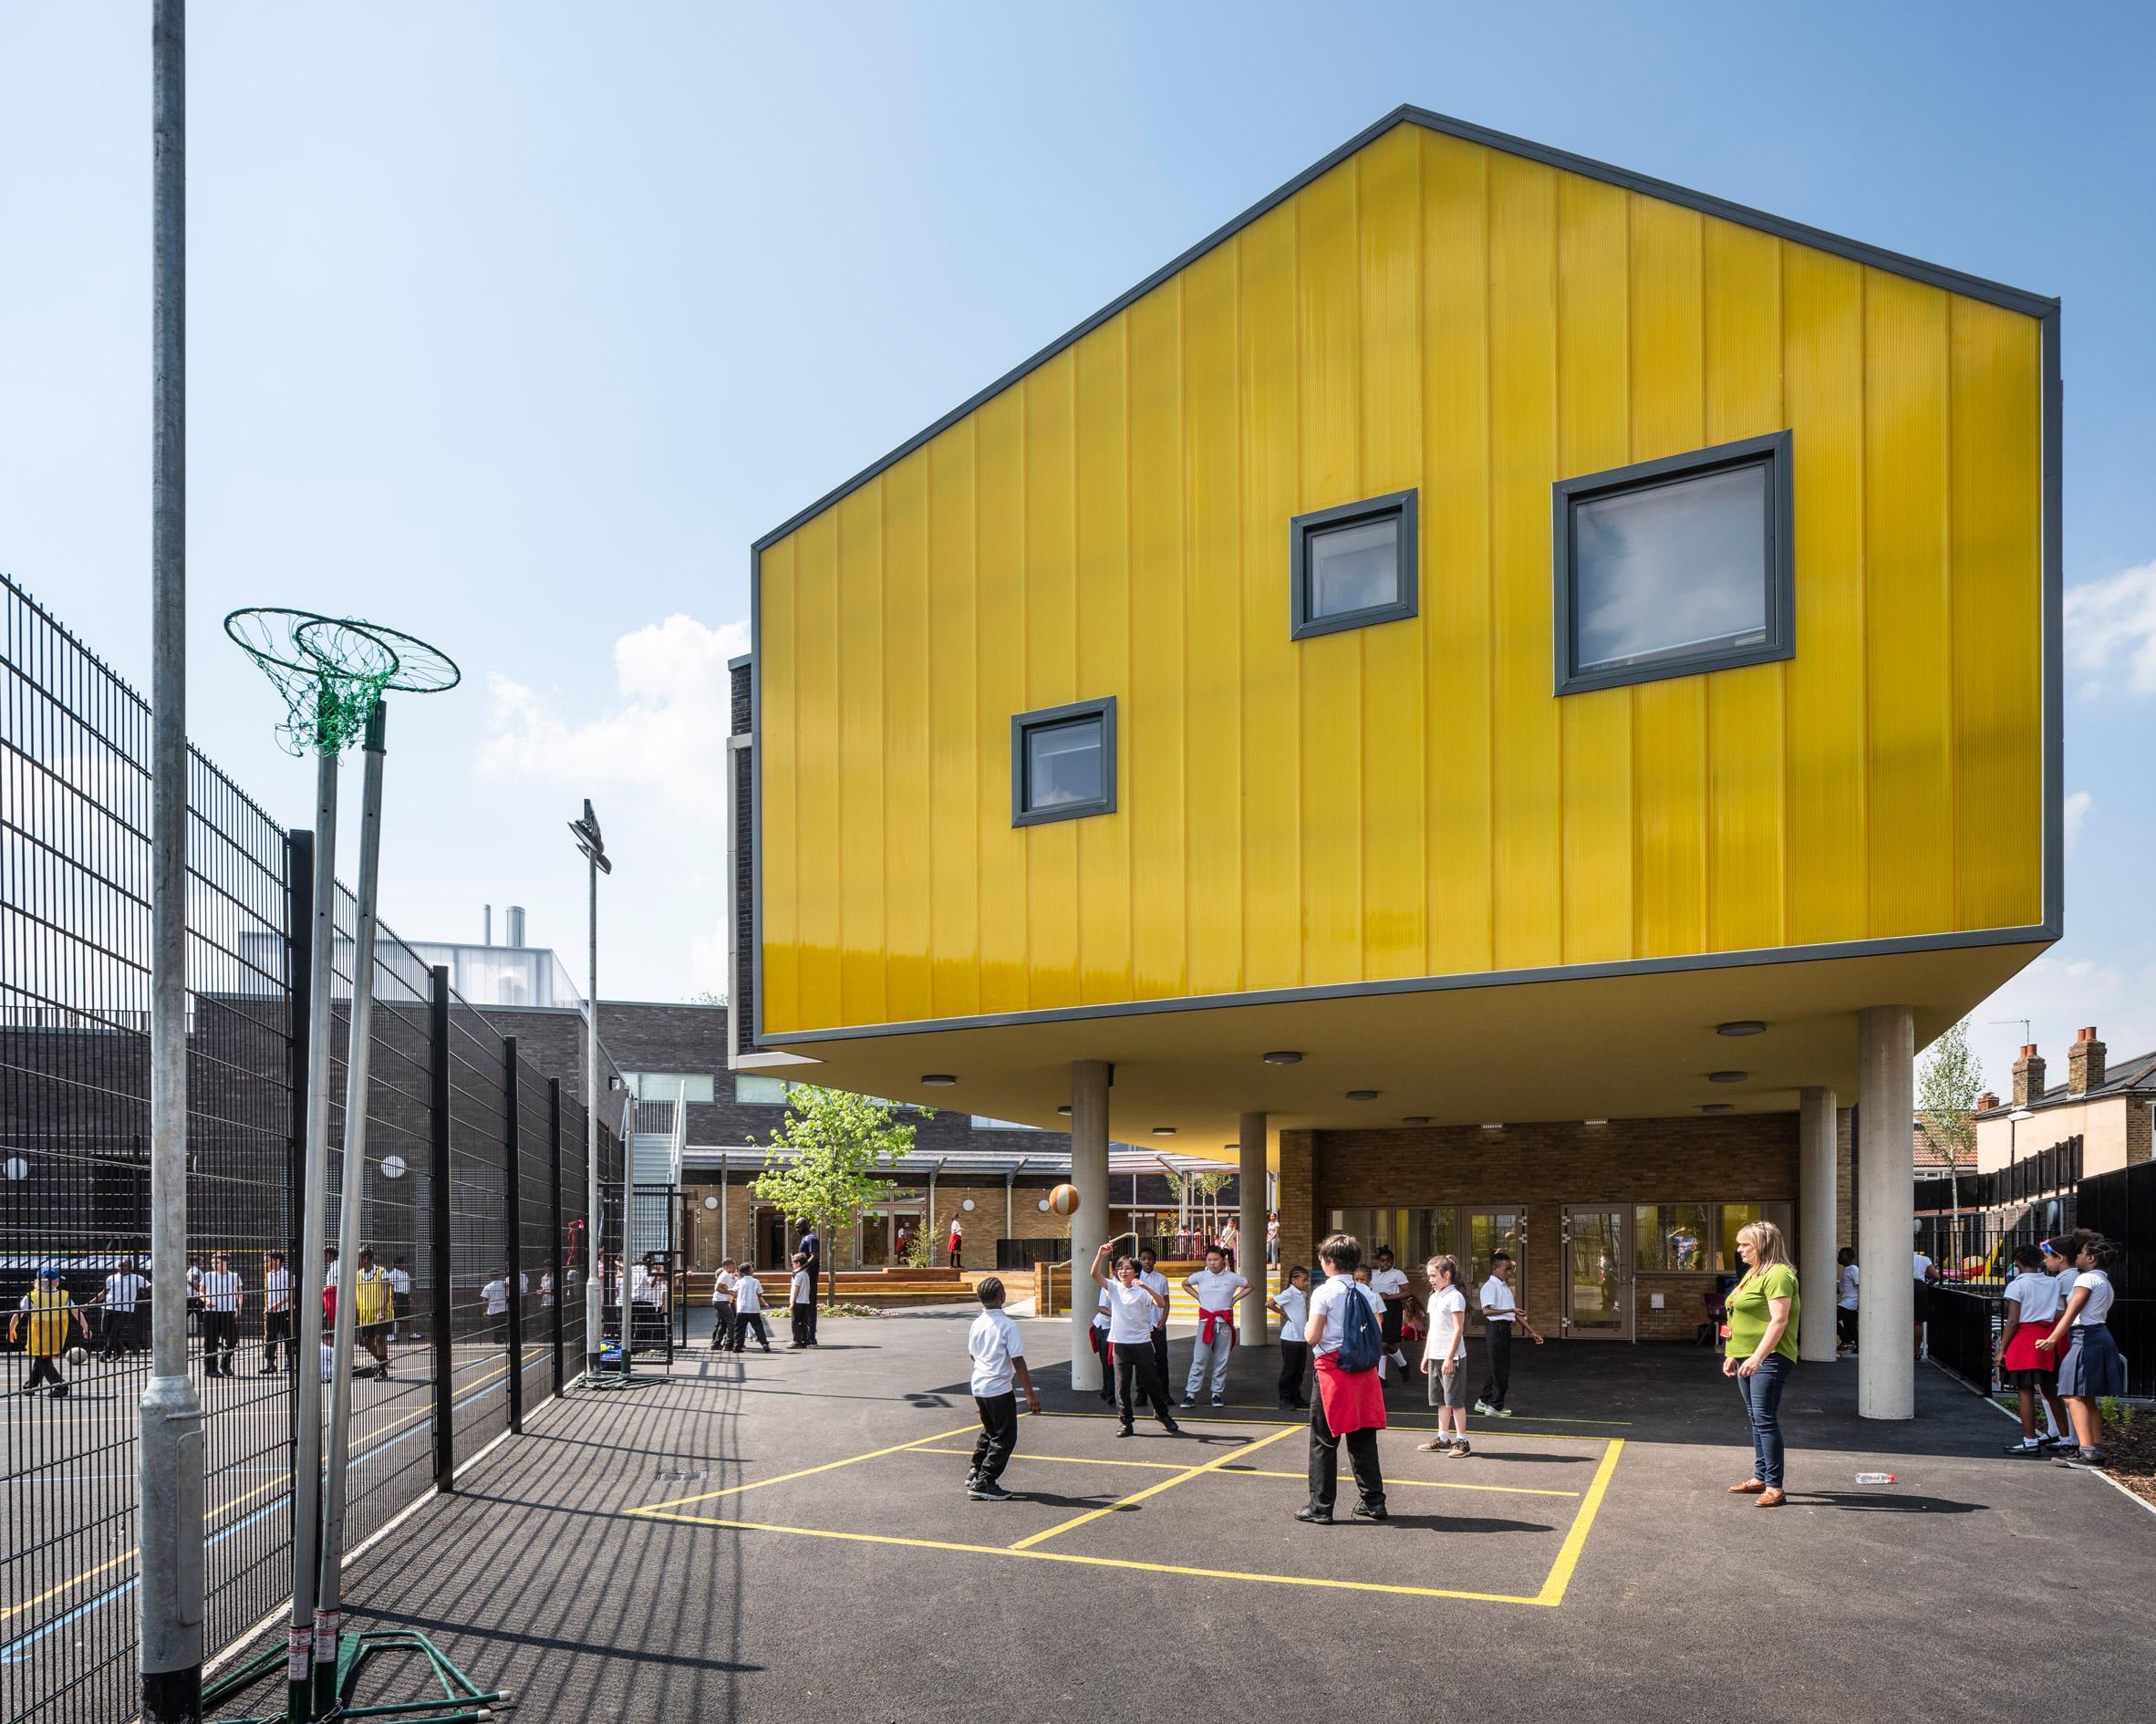 Bellenden Primary School in Peckham, London, by Cottrell and Vermeulen Architecture